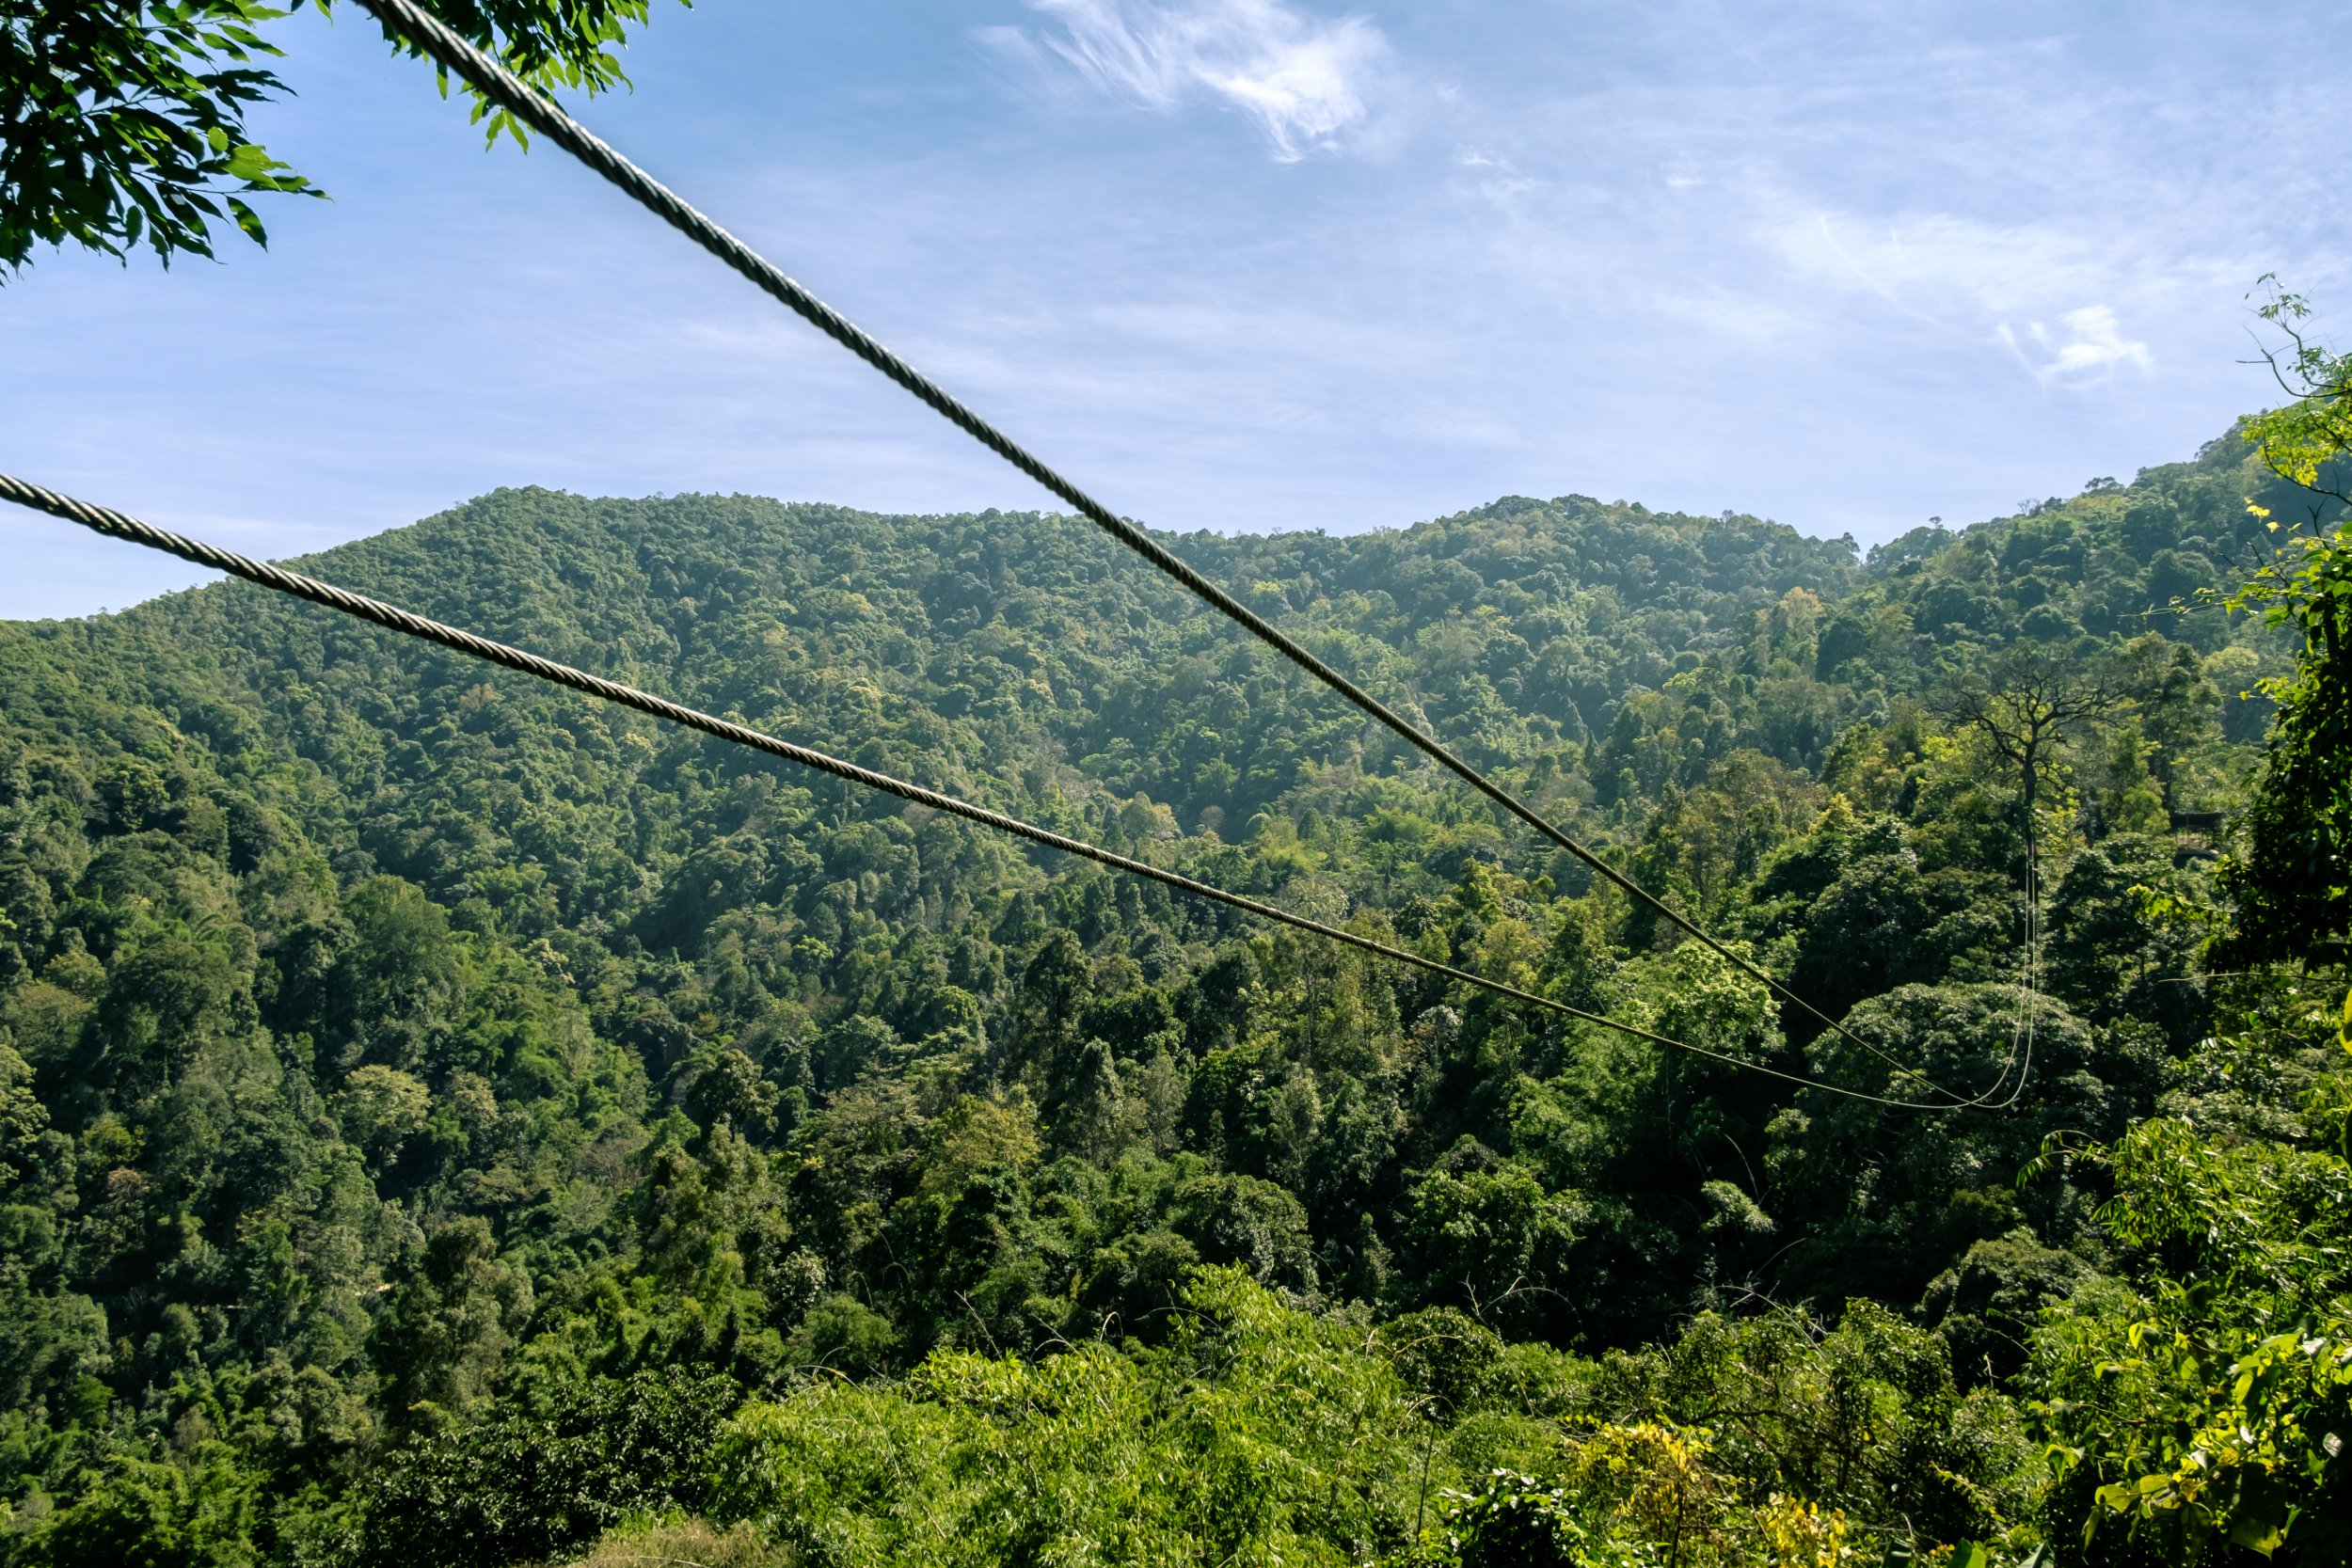 Tourist dies after zipline snaps on 'Flight of the Gibbon' through jungle